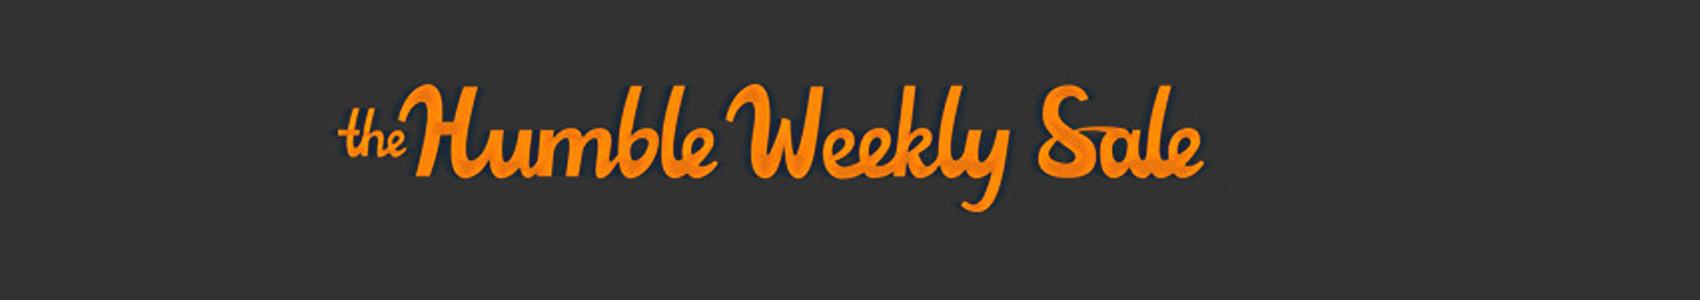 humble-weekly-sale-head-HD